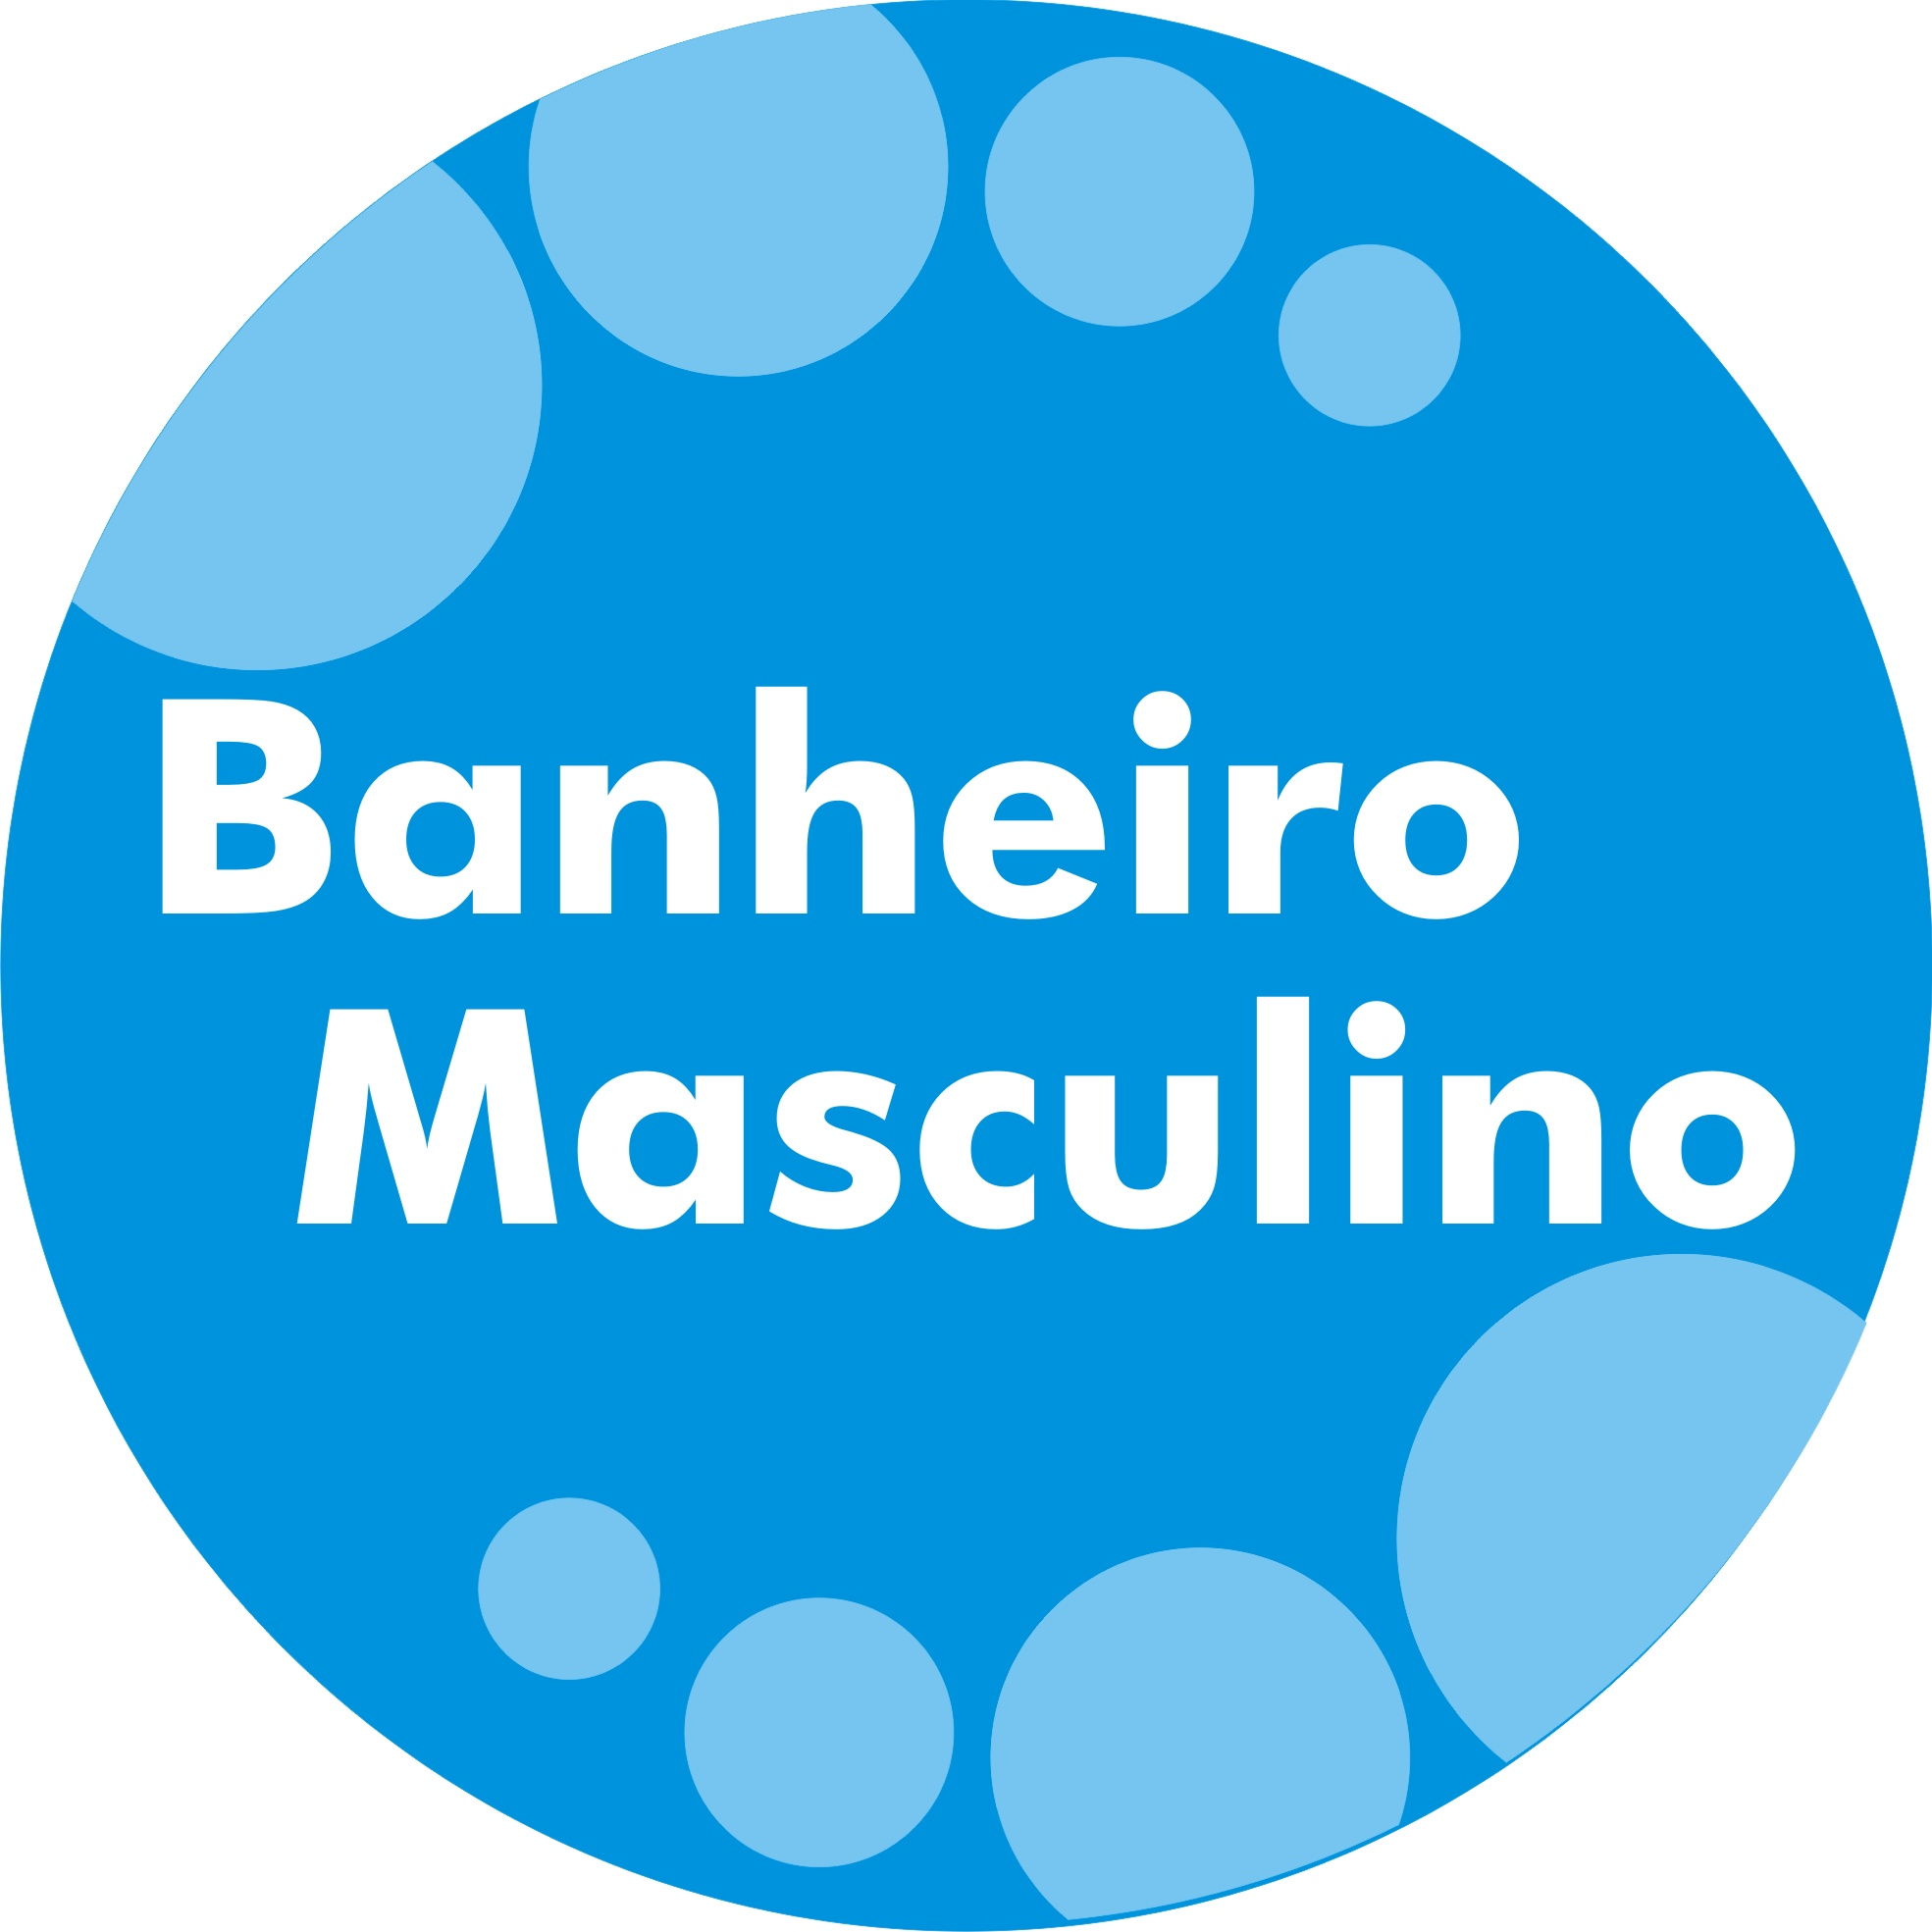 Placa Banheiro Masculino by heglys on DeviantArt #0087CC 1969 1969